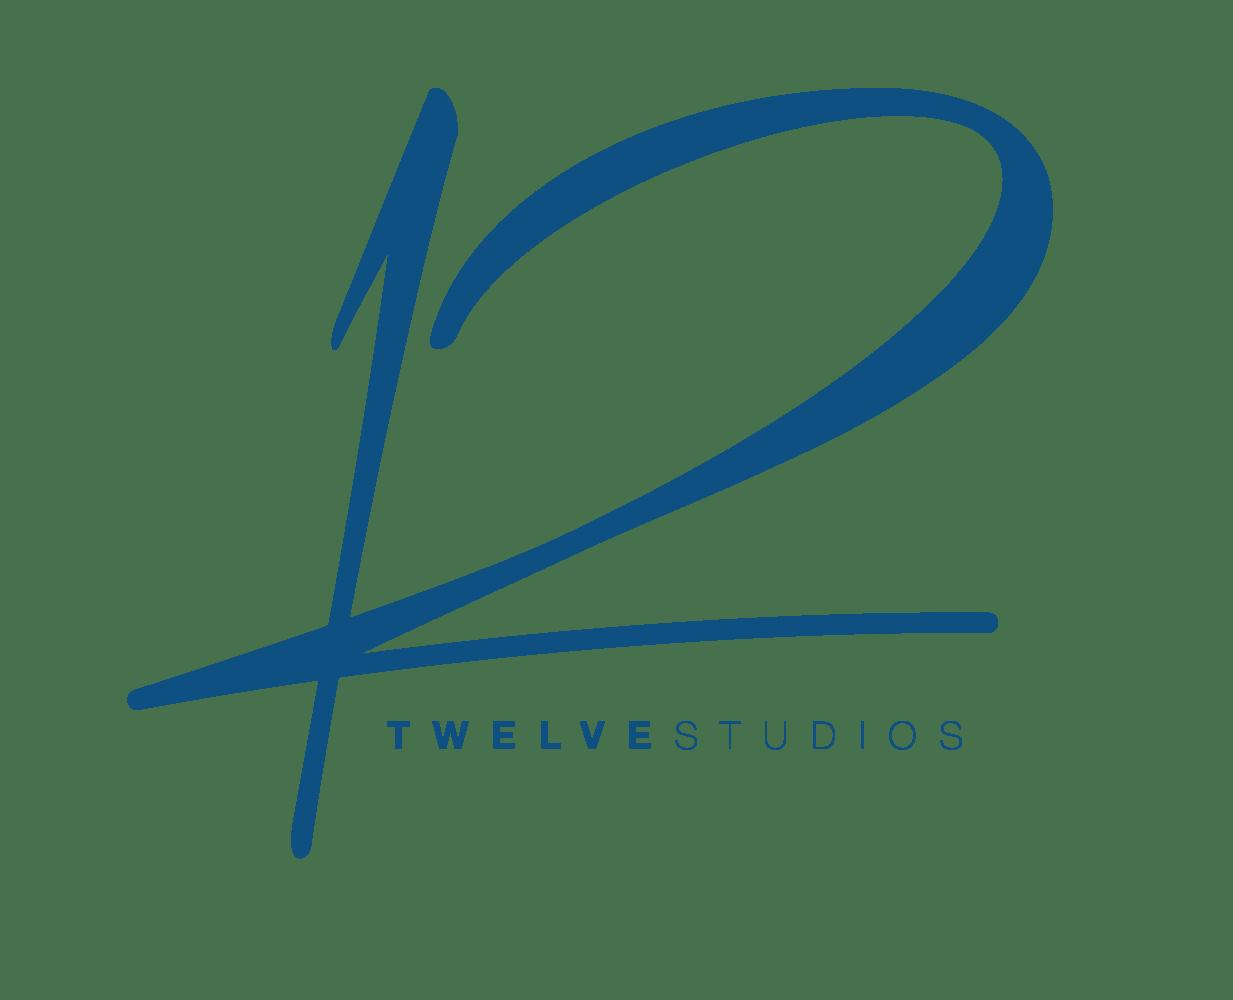 twelve-studios-logo